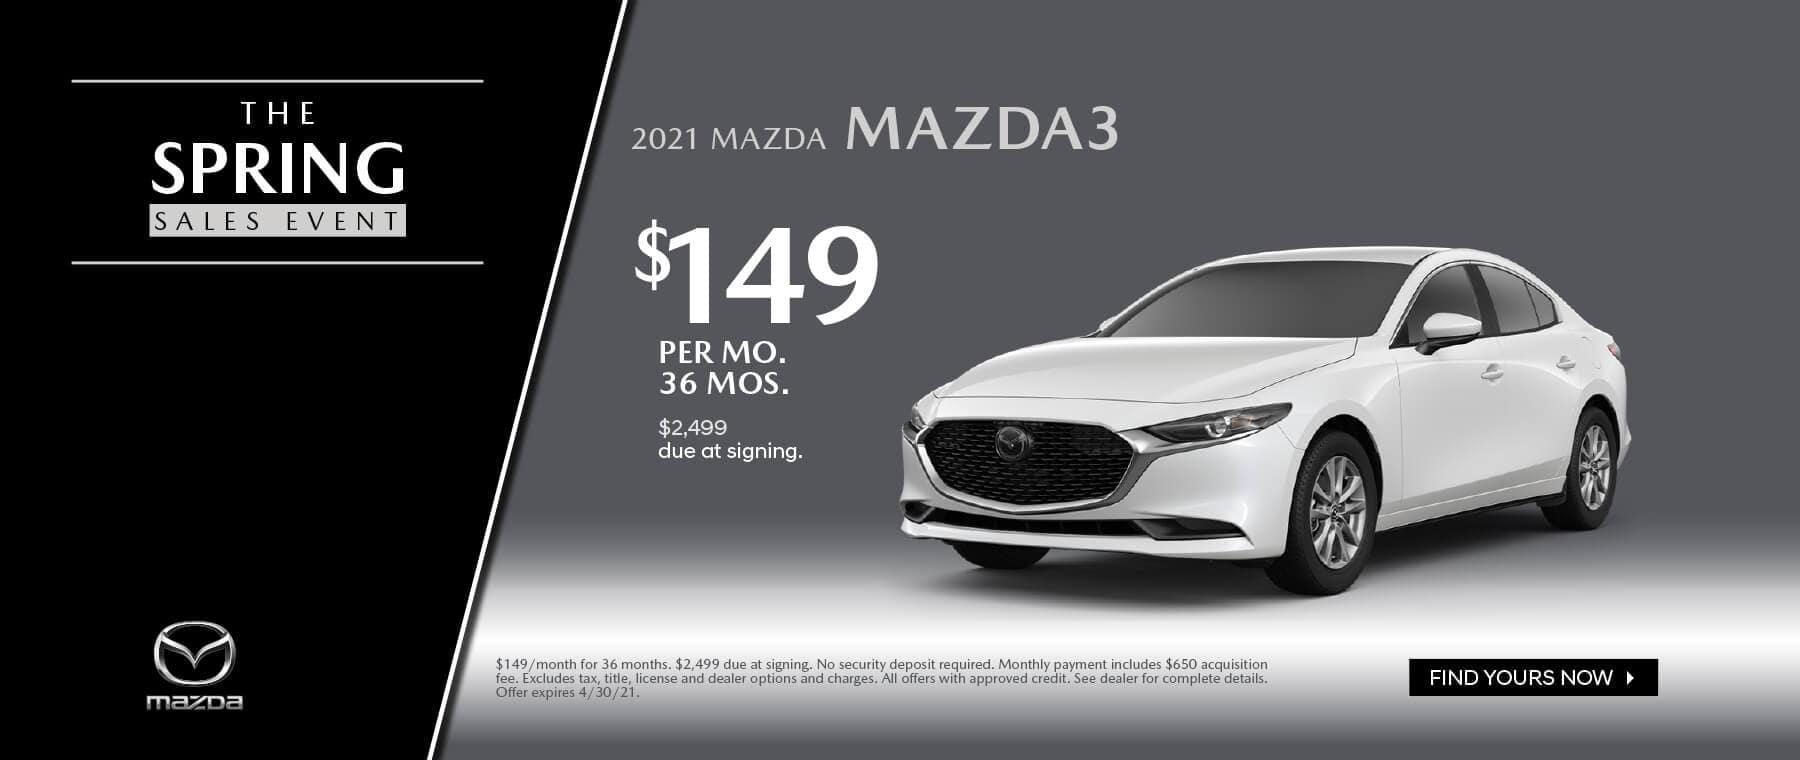 2021.03.26-Keffer-Mazda-APR-Web-Banners-S51614vw-7